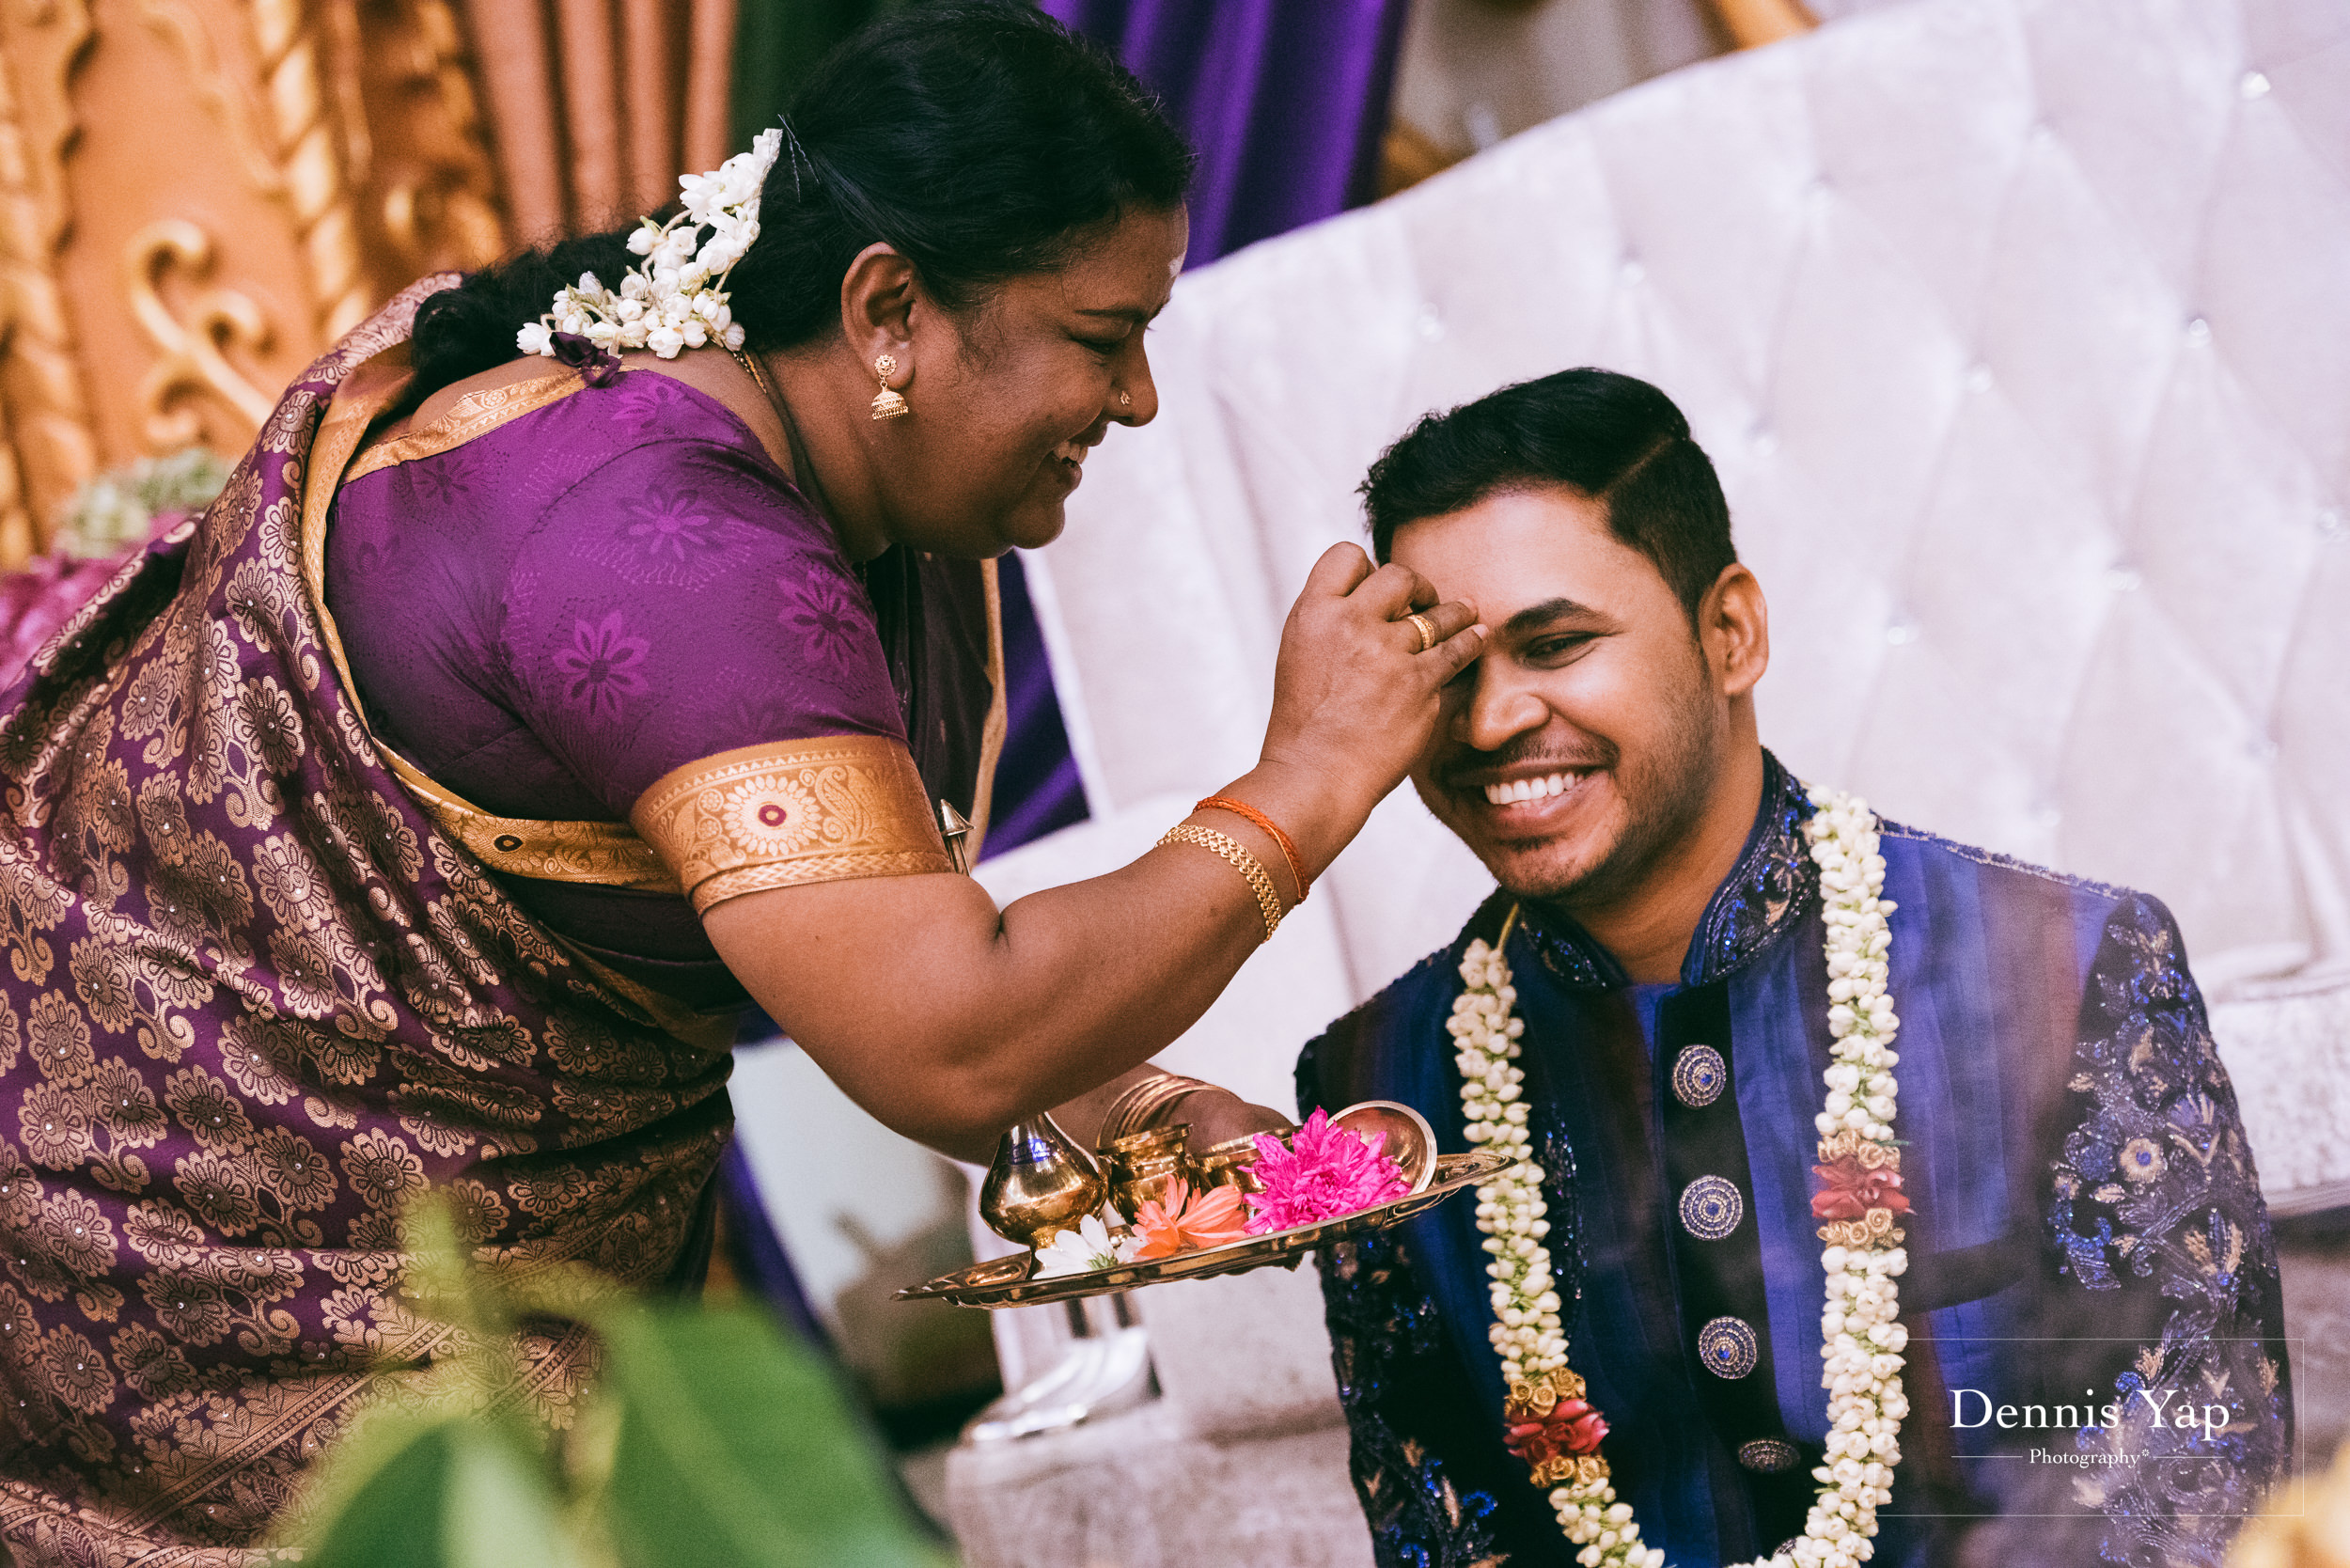 puvaneswaran cangitaa indian wedding ceremony ideal convention dennis yap photography malaysia-16.jpg